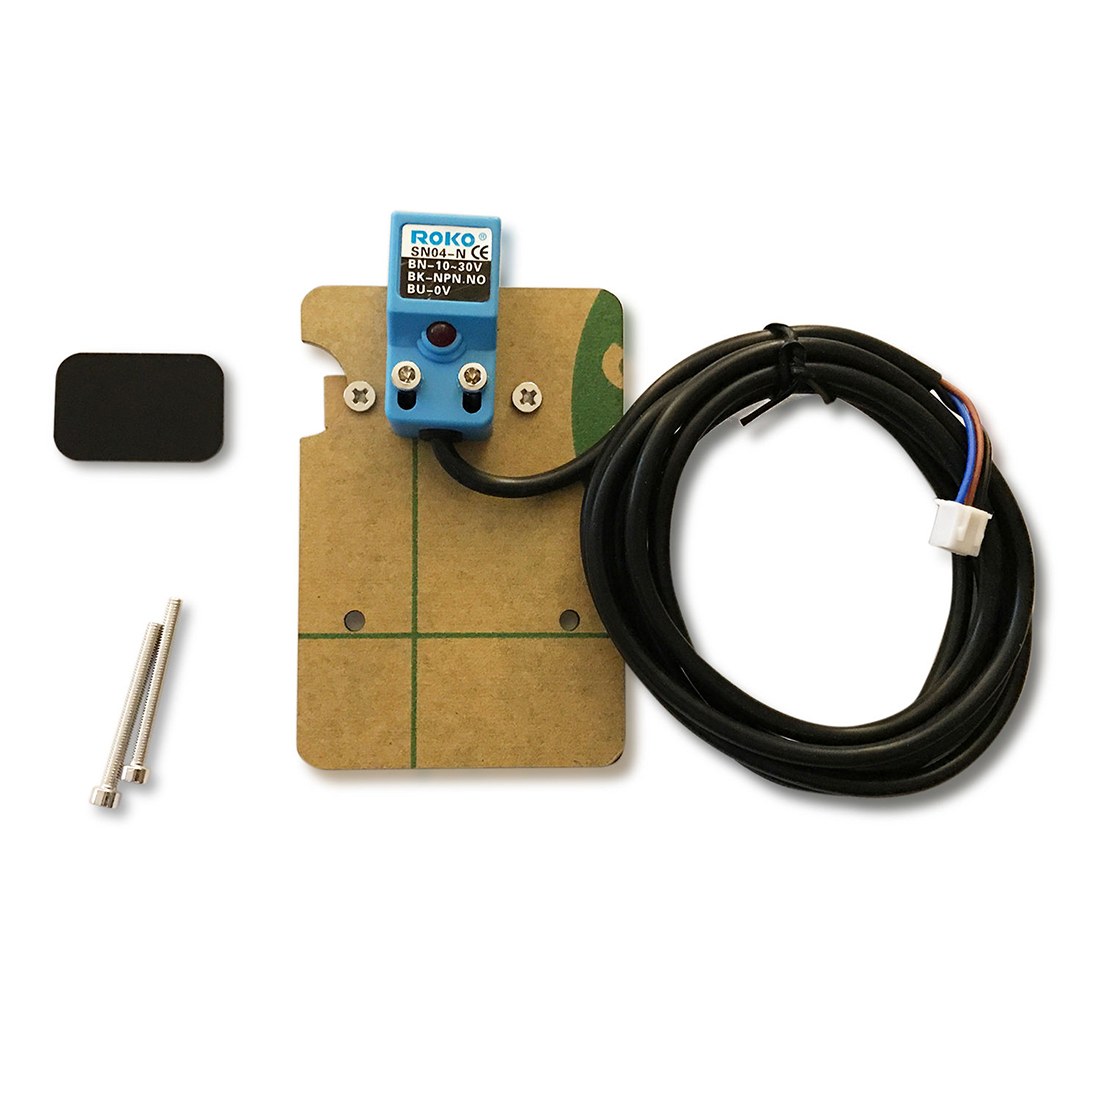 New-arrival-auto-leveling-position-sensor-for-anet-a8-prusa-i3-3d-printer-reprap Laatste Stijl